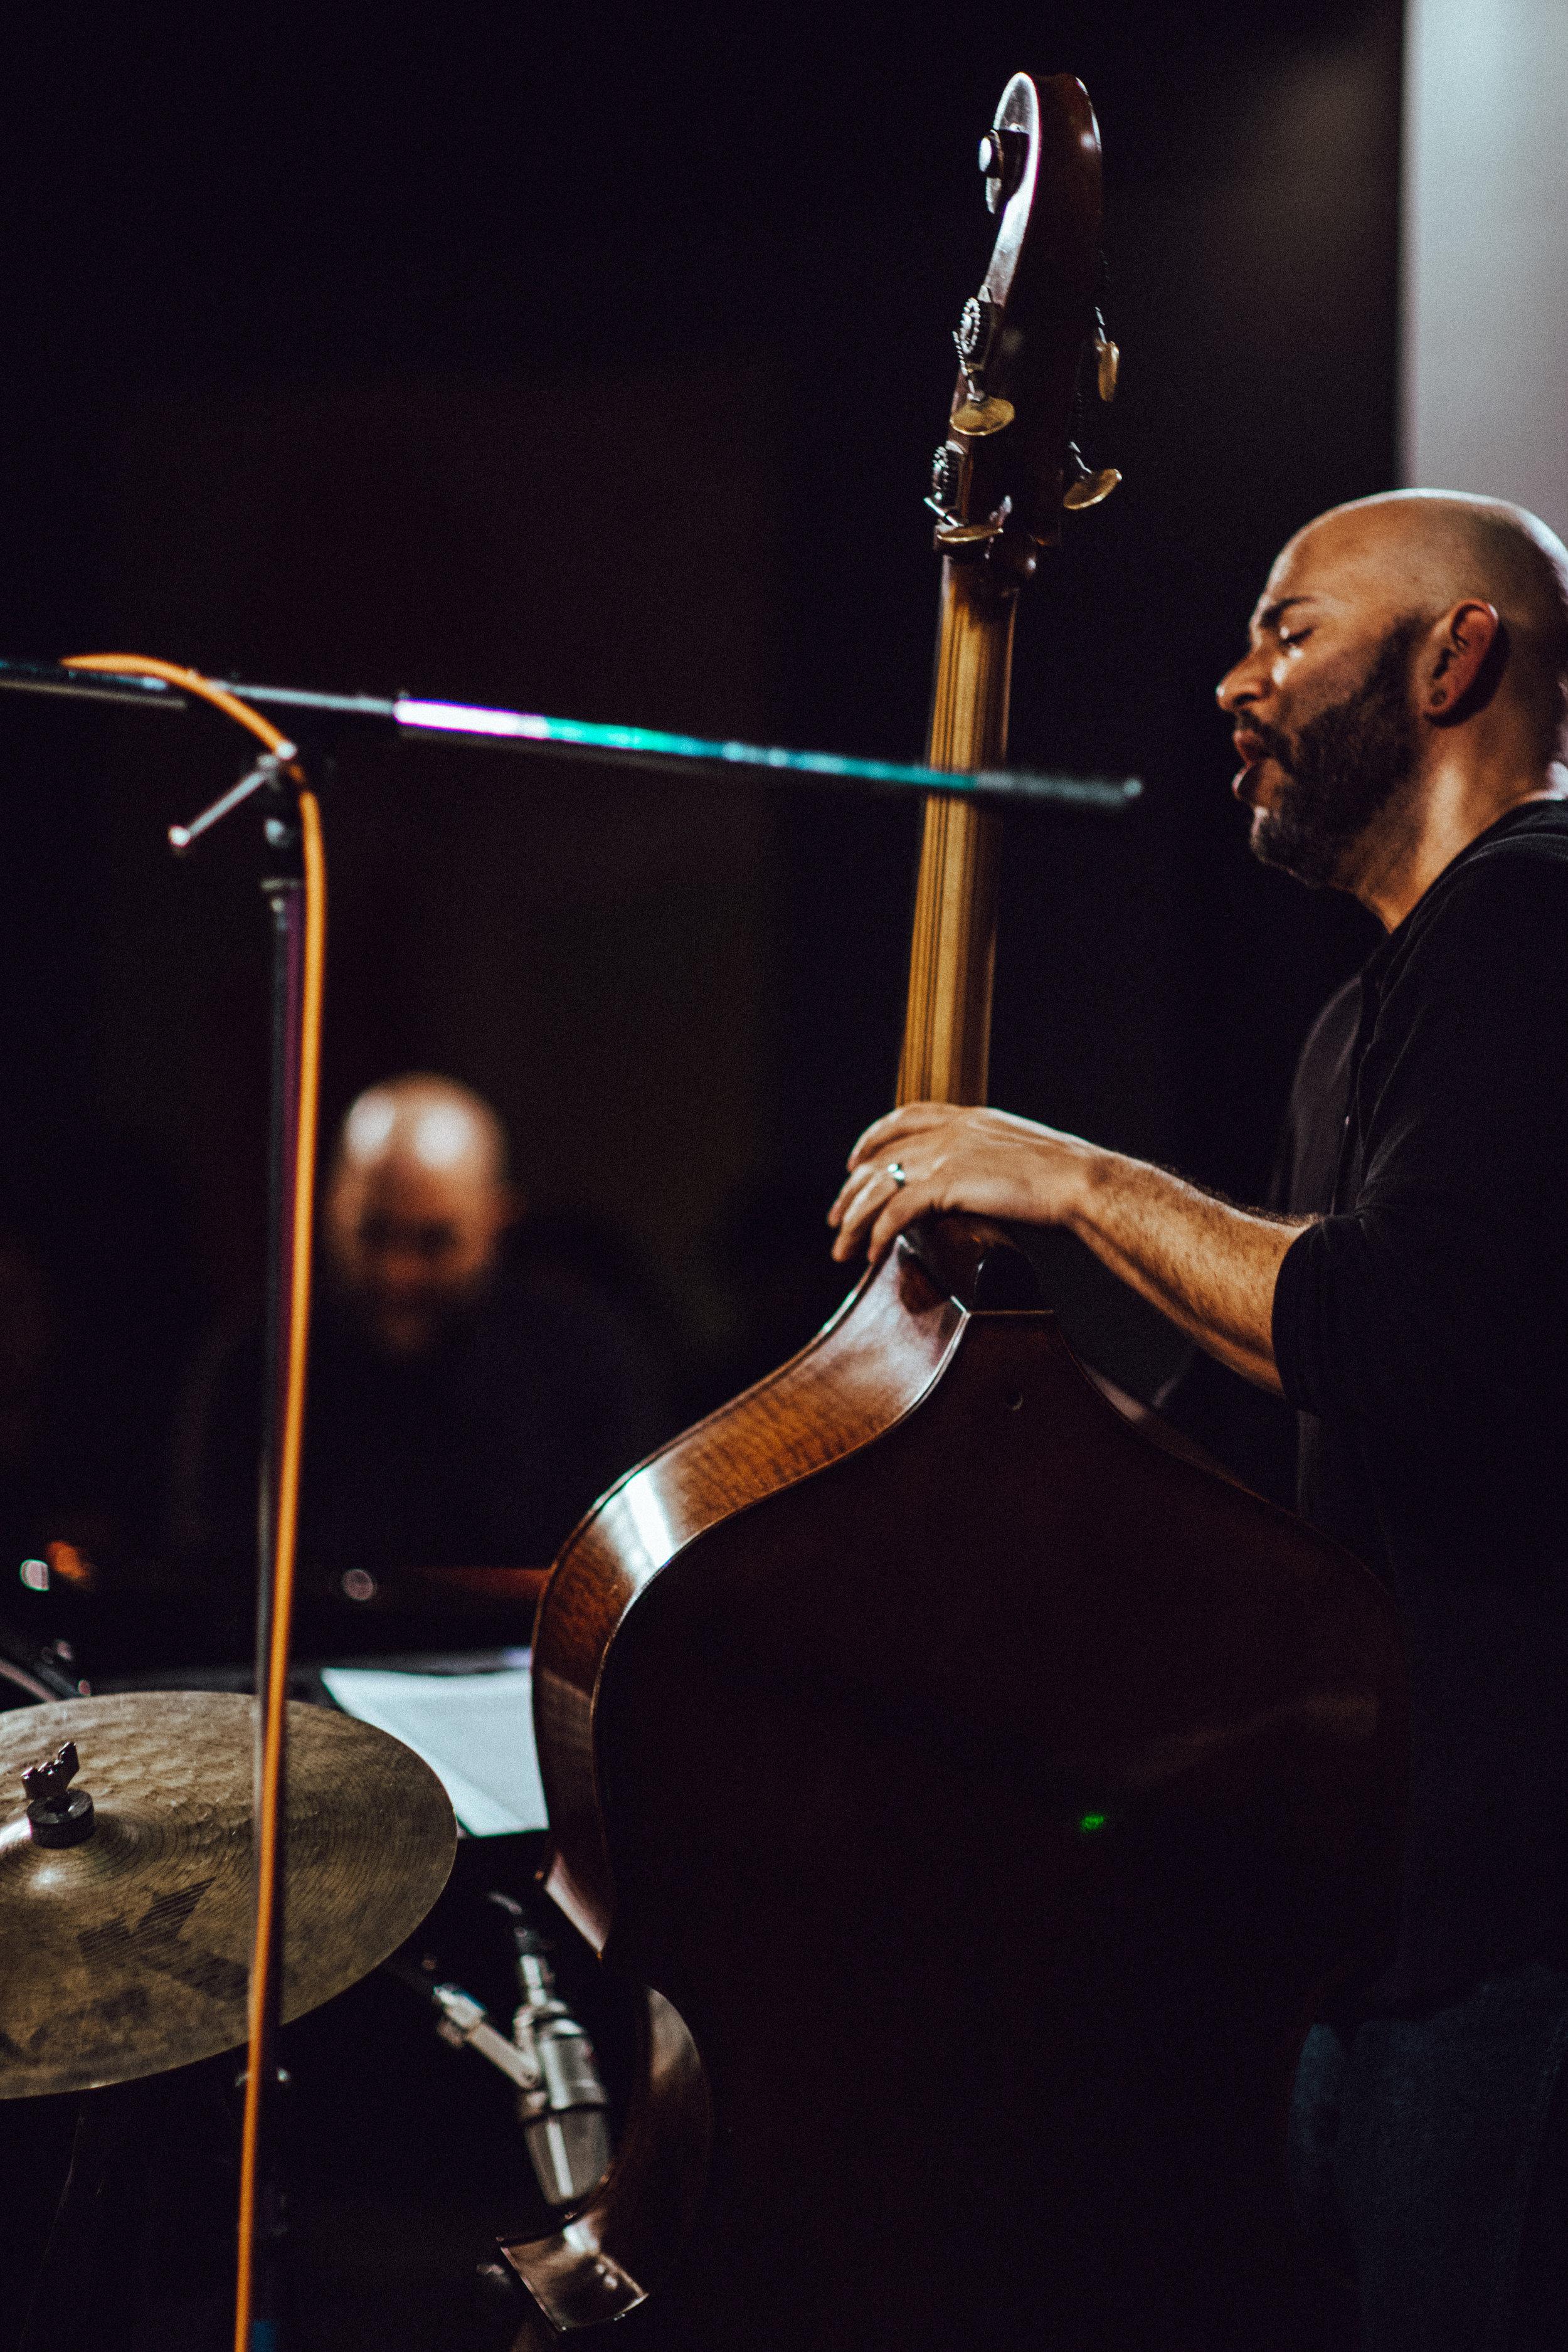 Armen Nalbandian Trio ~ Armen Nalbandian & Eric Revis